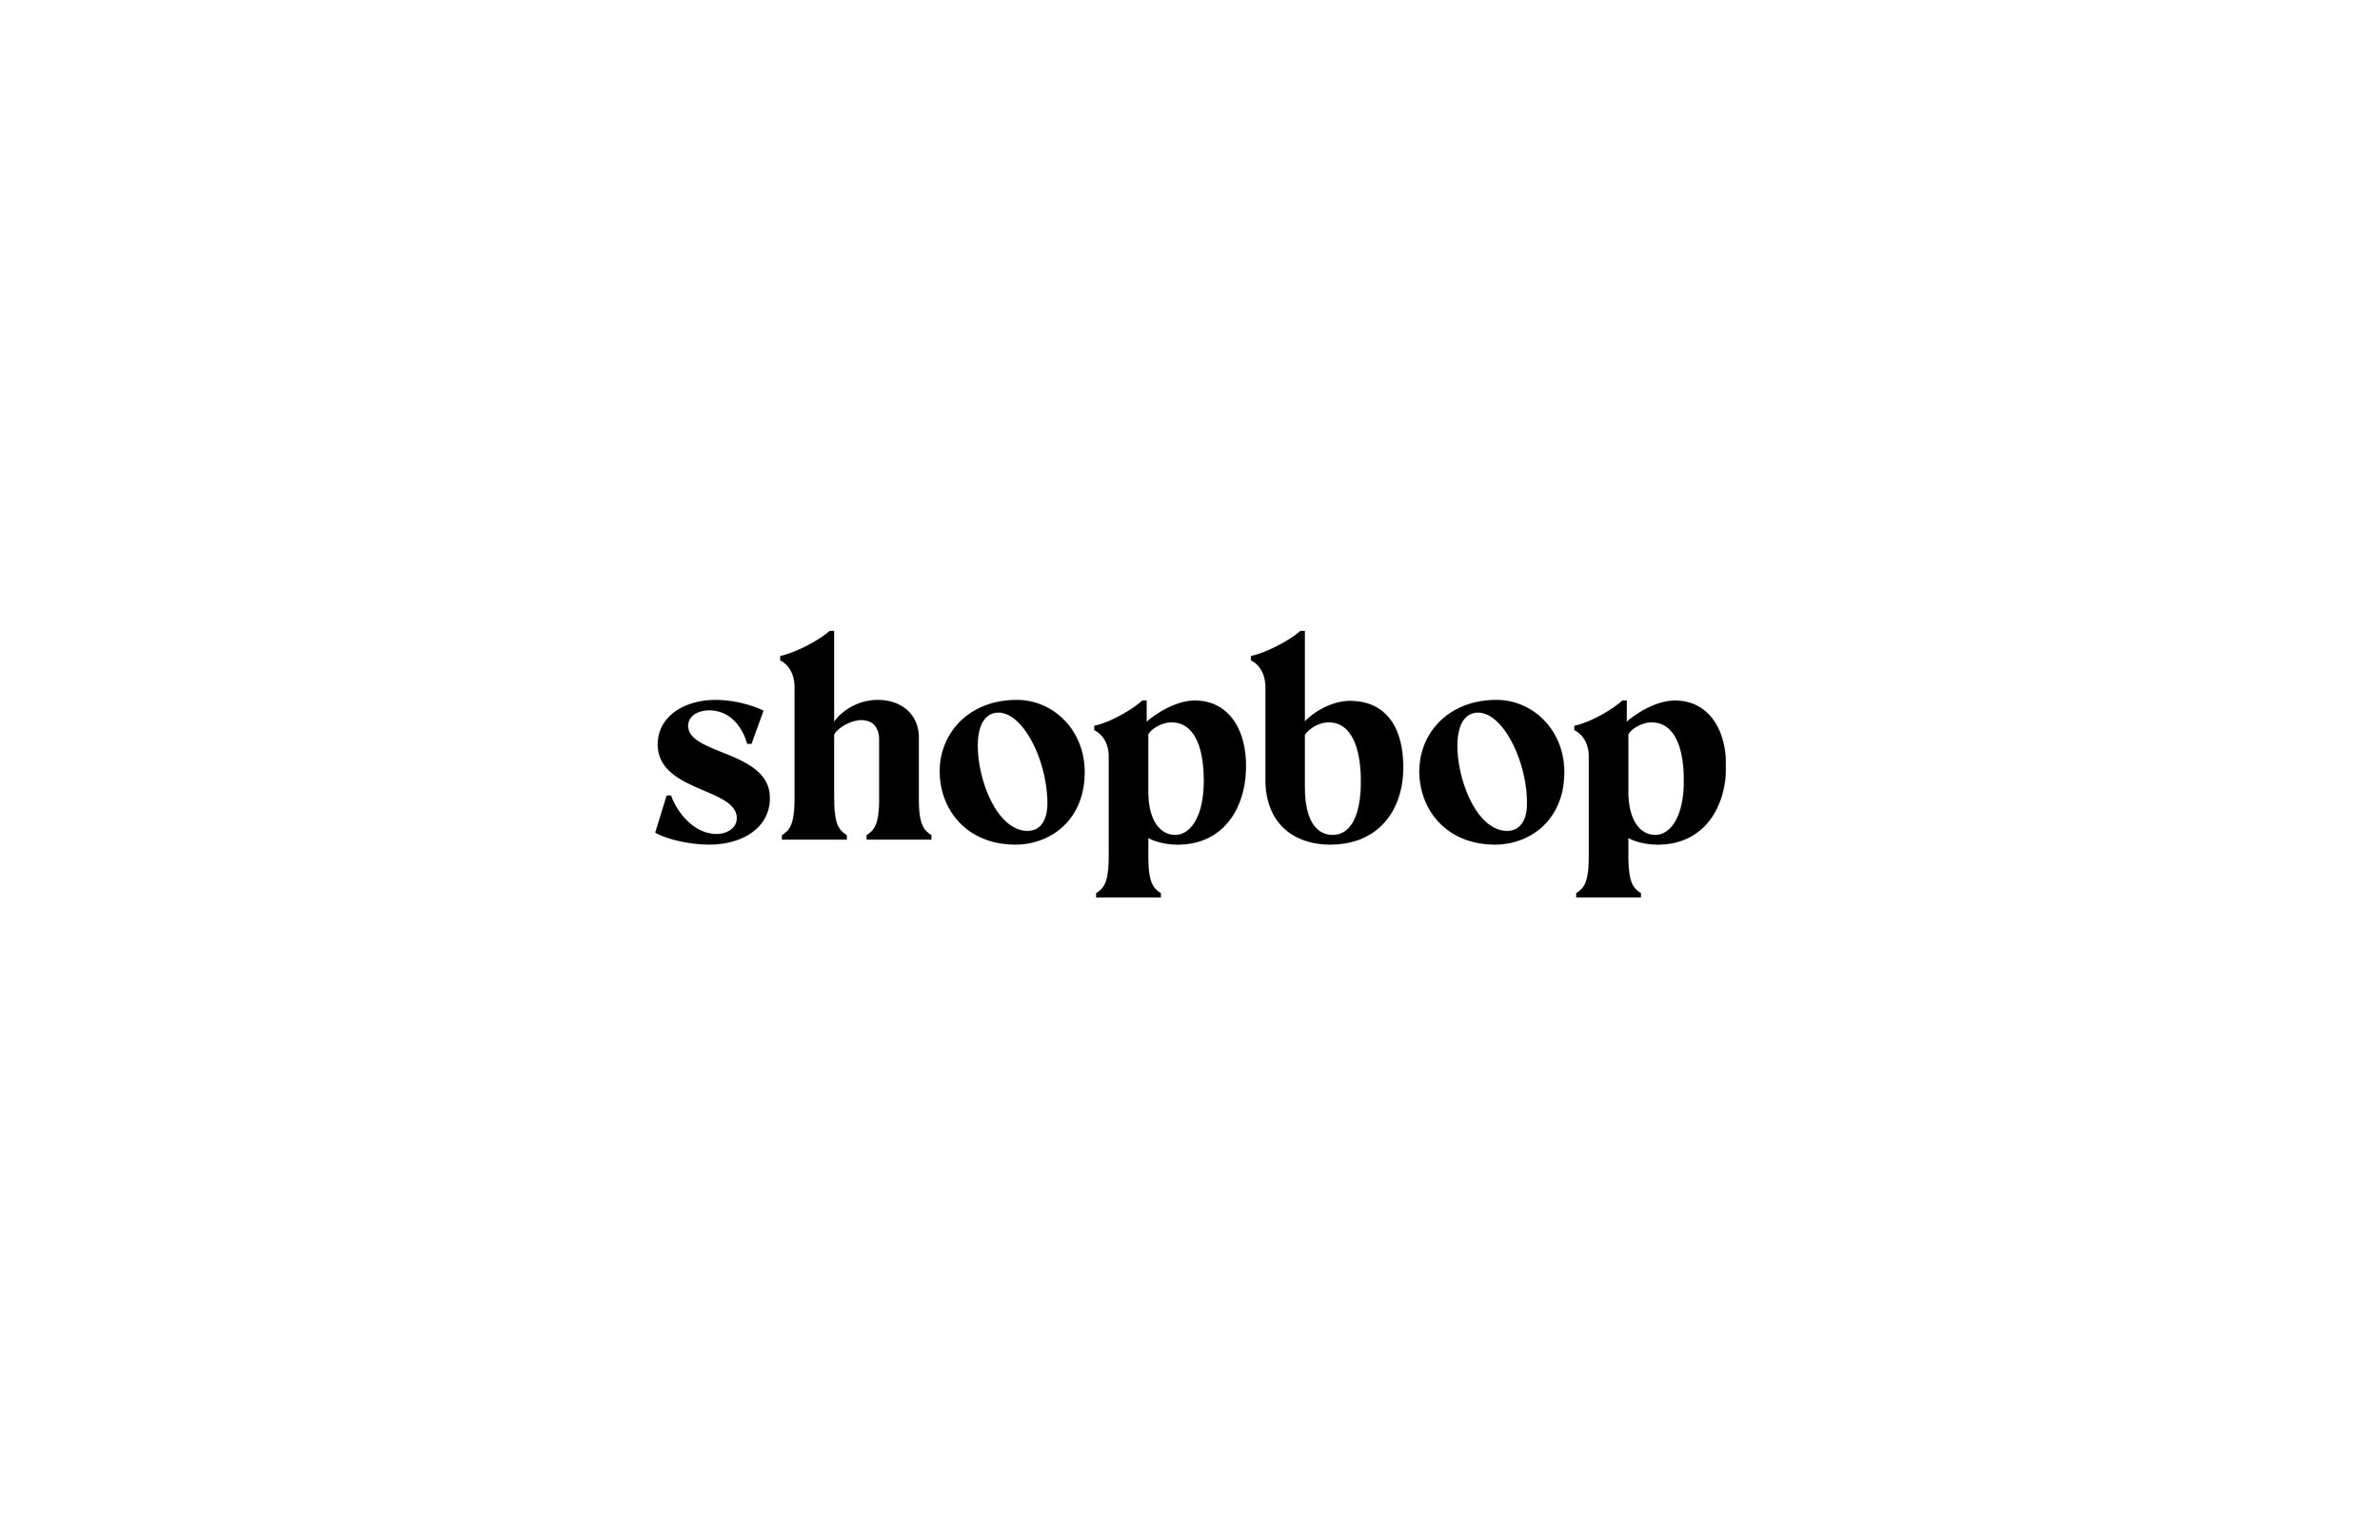 Shopbop_05.jpg